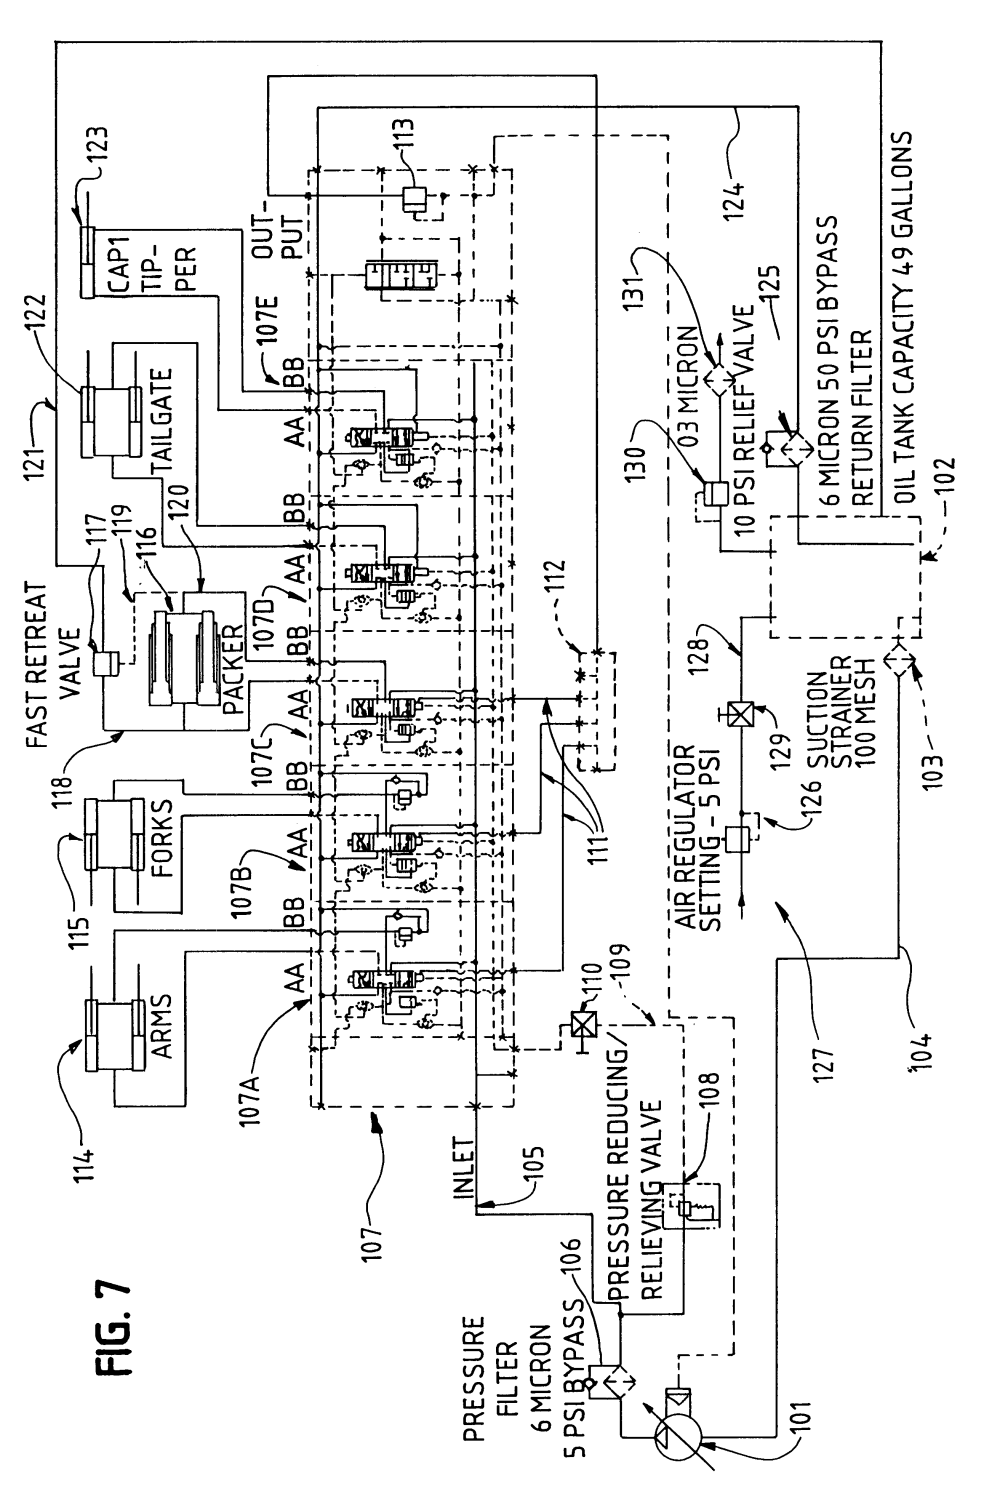 medium resolution of palfinger wiring diagrams wiring diagram todaysmcneilus wiring diagrams simple wiring diagram schema terex wiring diagrams palfinger